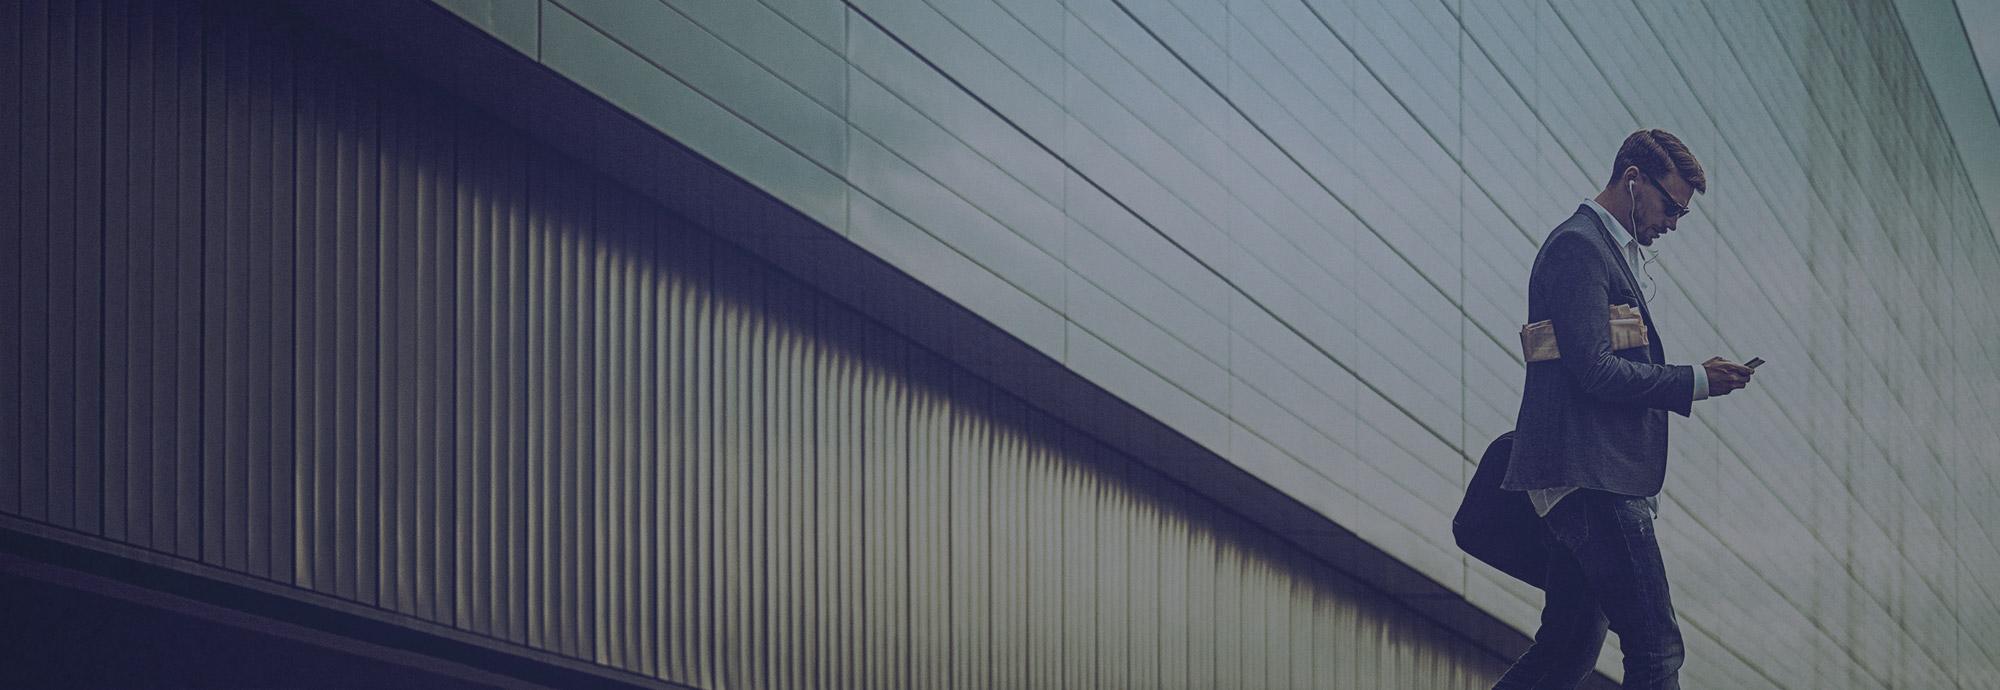 Assicurazioni Per Professionisti E Imprese Amtrust Europe Limited